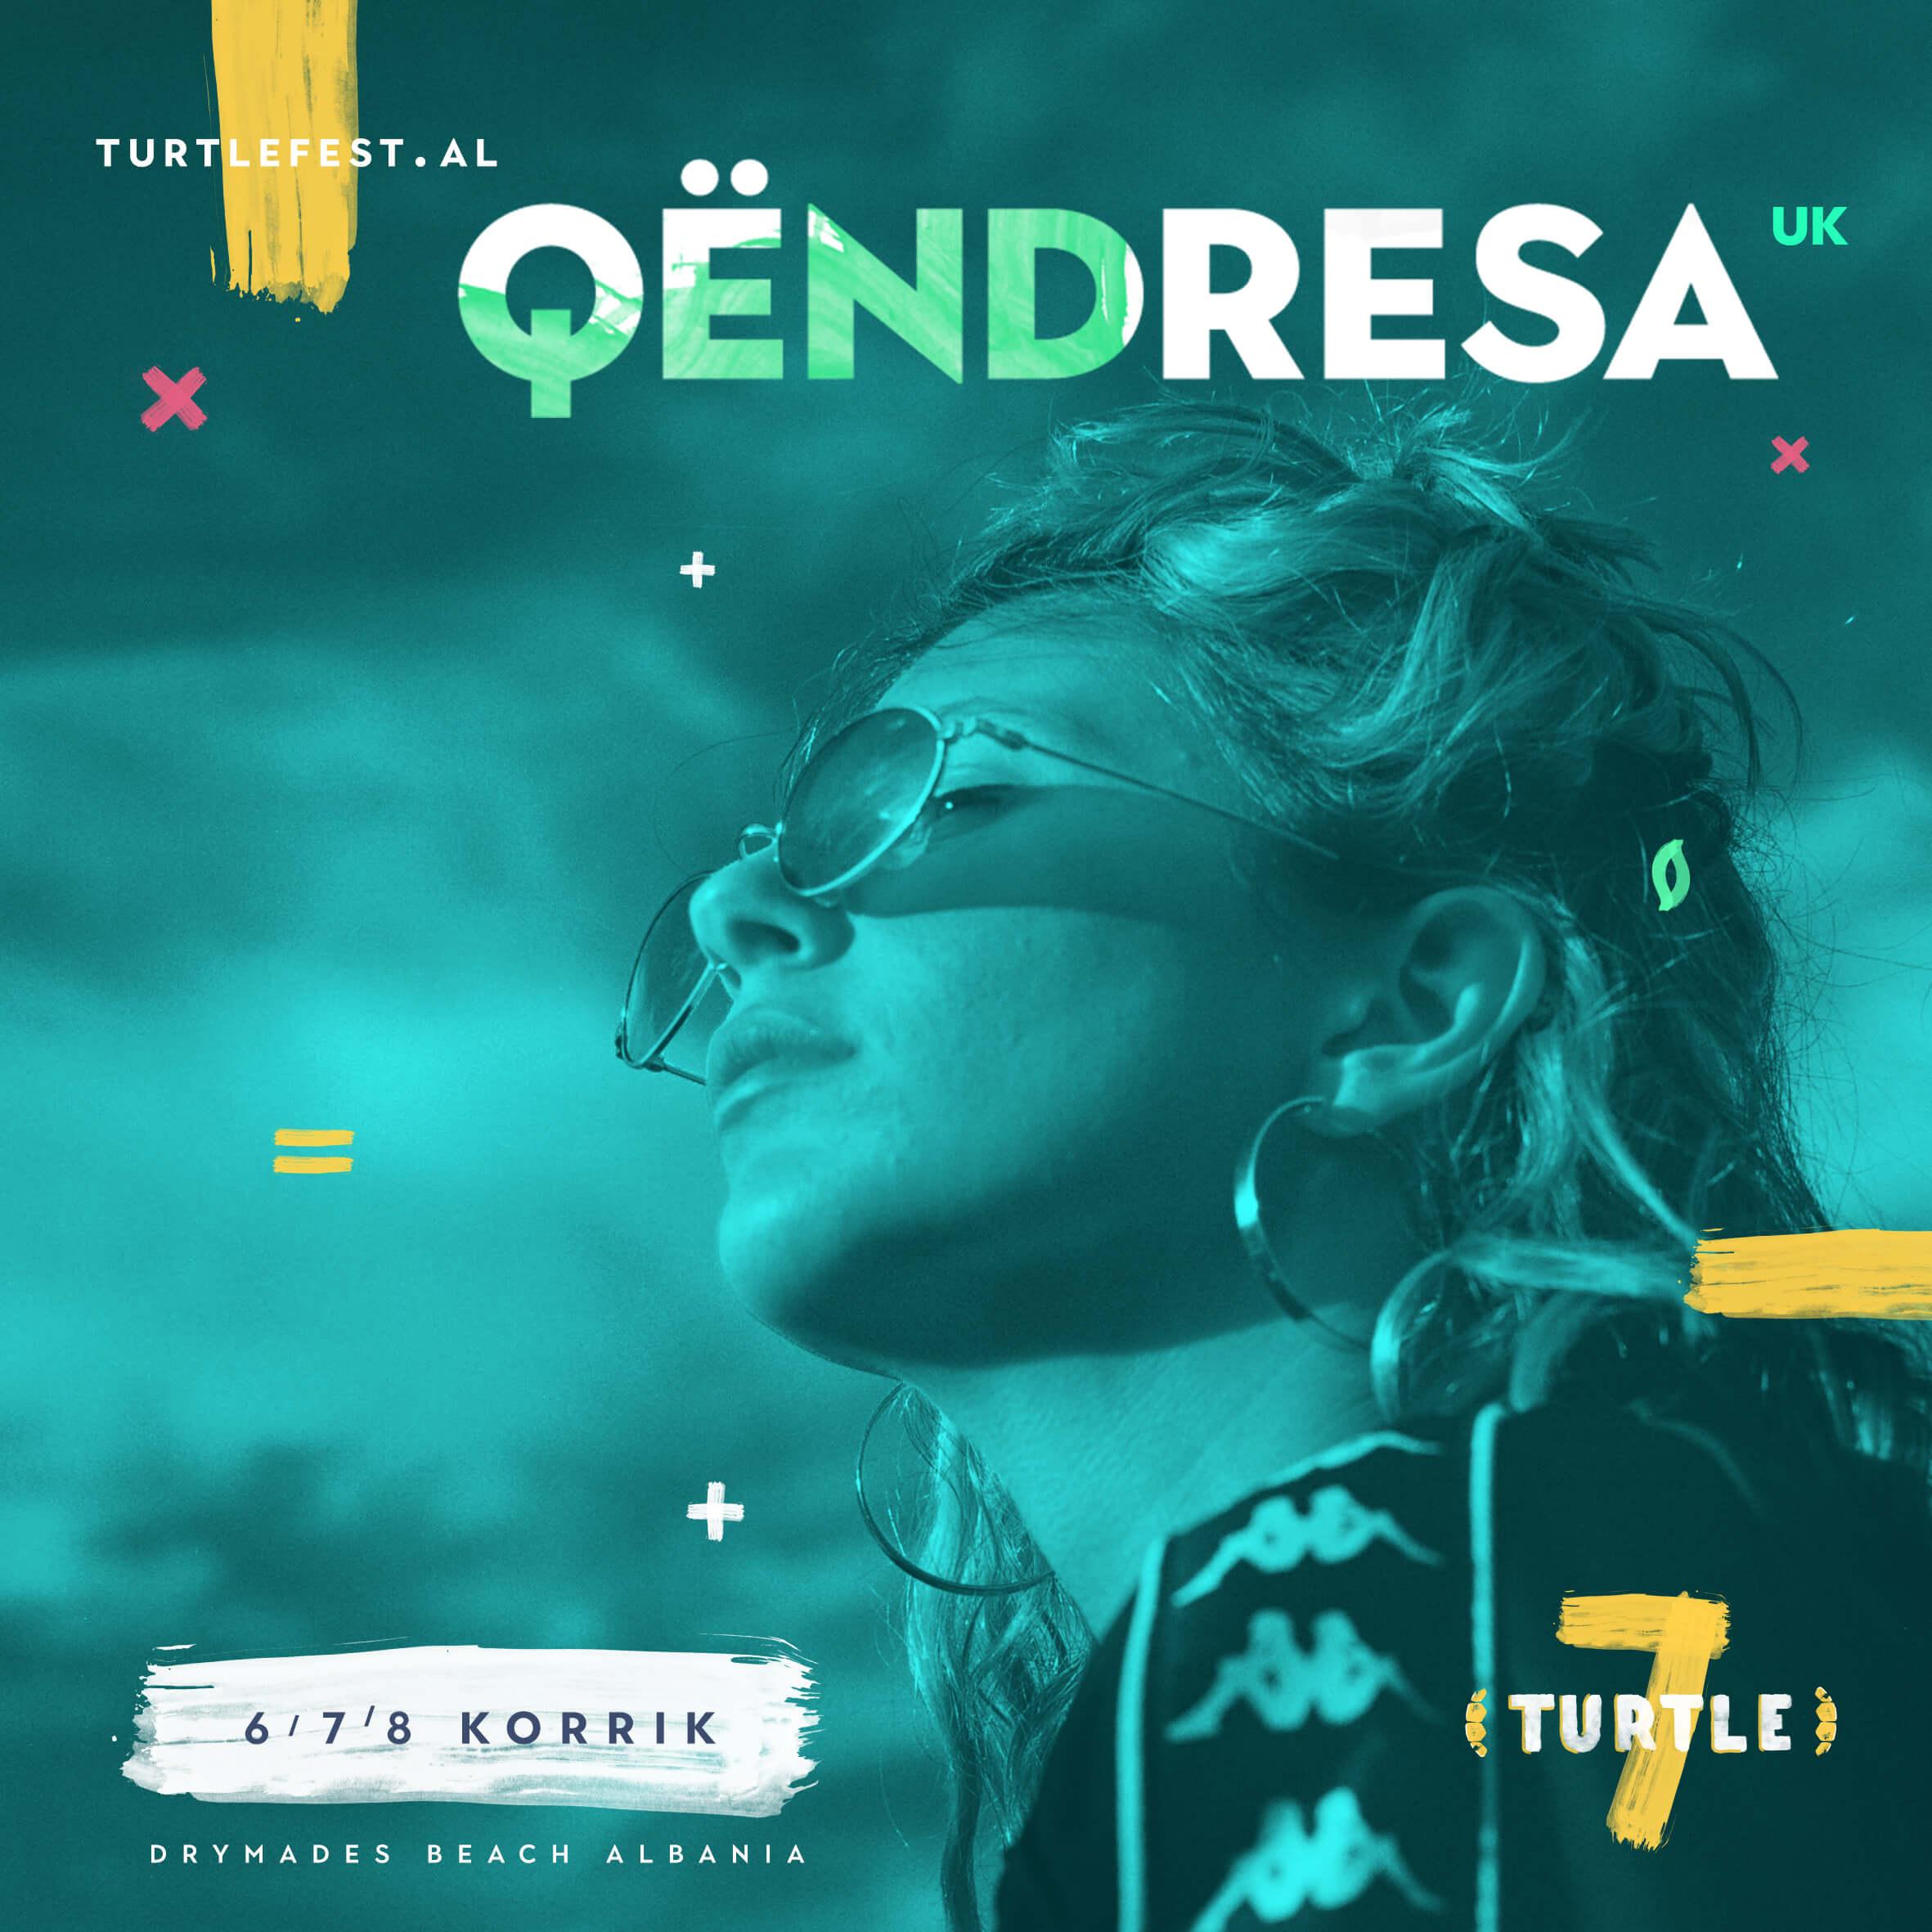 Qendresa - Turtle Fest